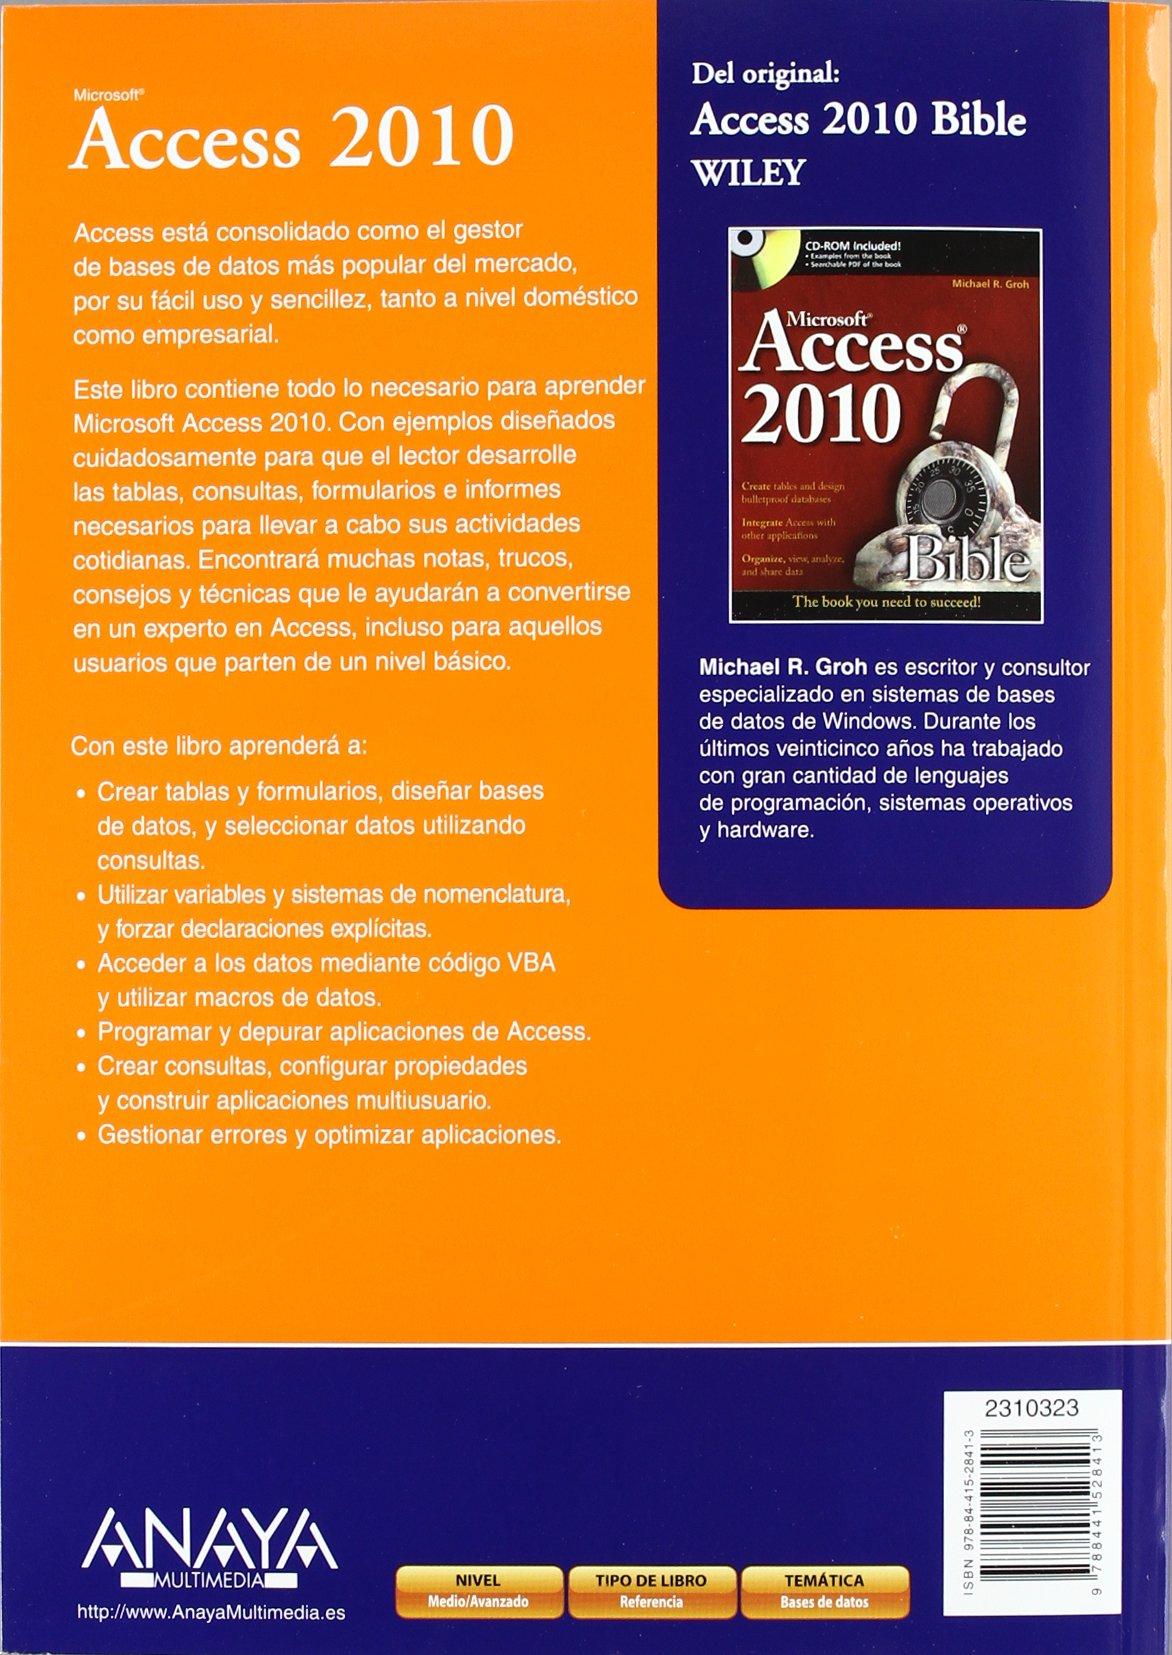 Microsoft Access 2010 Download